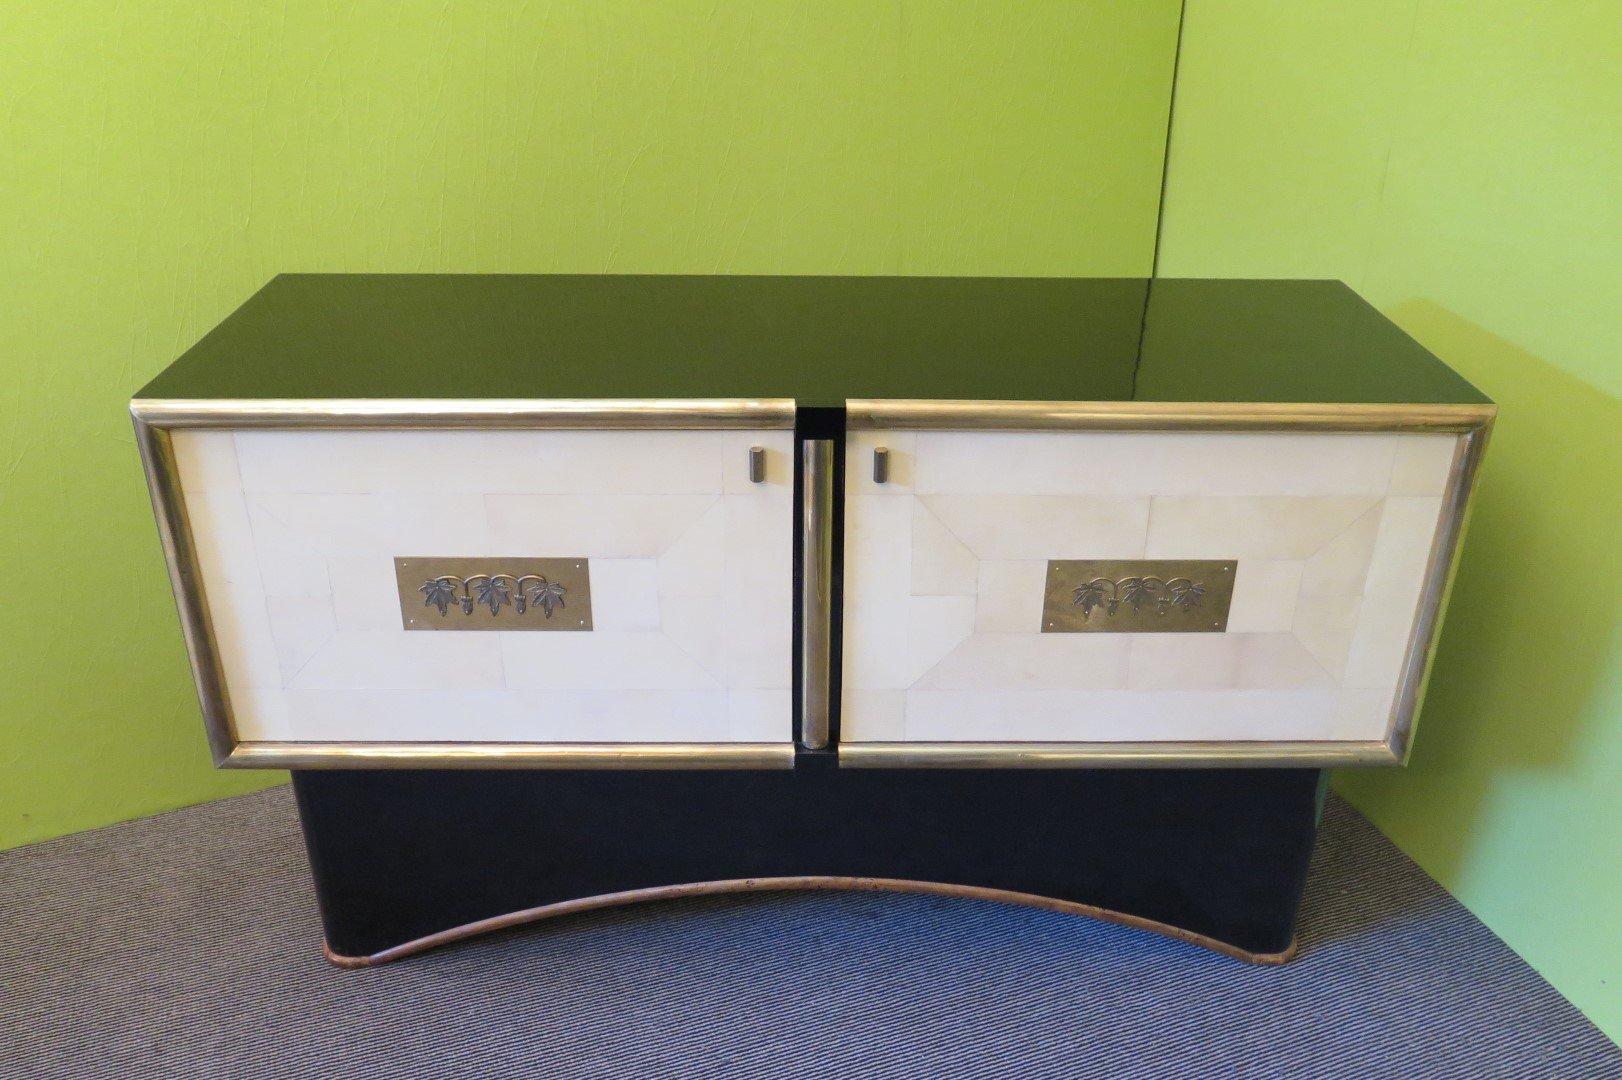 enfilade art d co italie 1930s en vente sur pamono. Black Bedroom Furniture Sets. Home Design Ideas